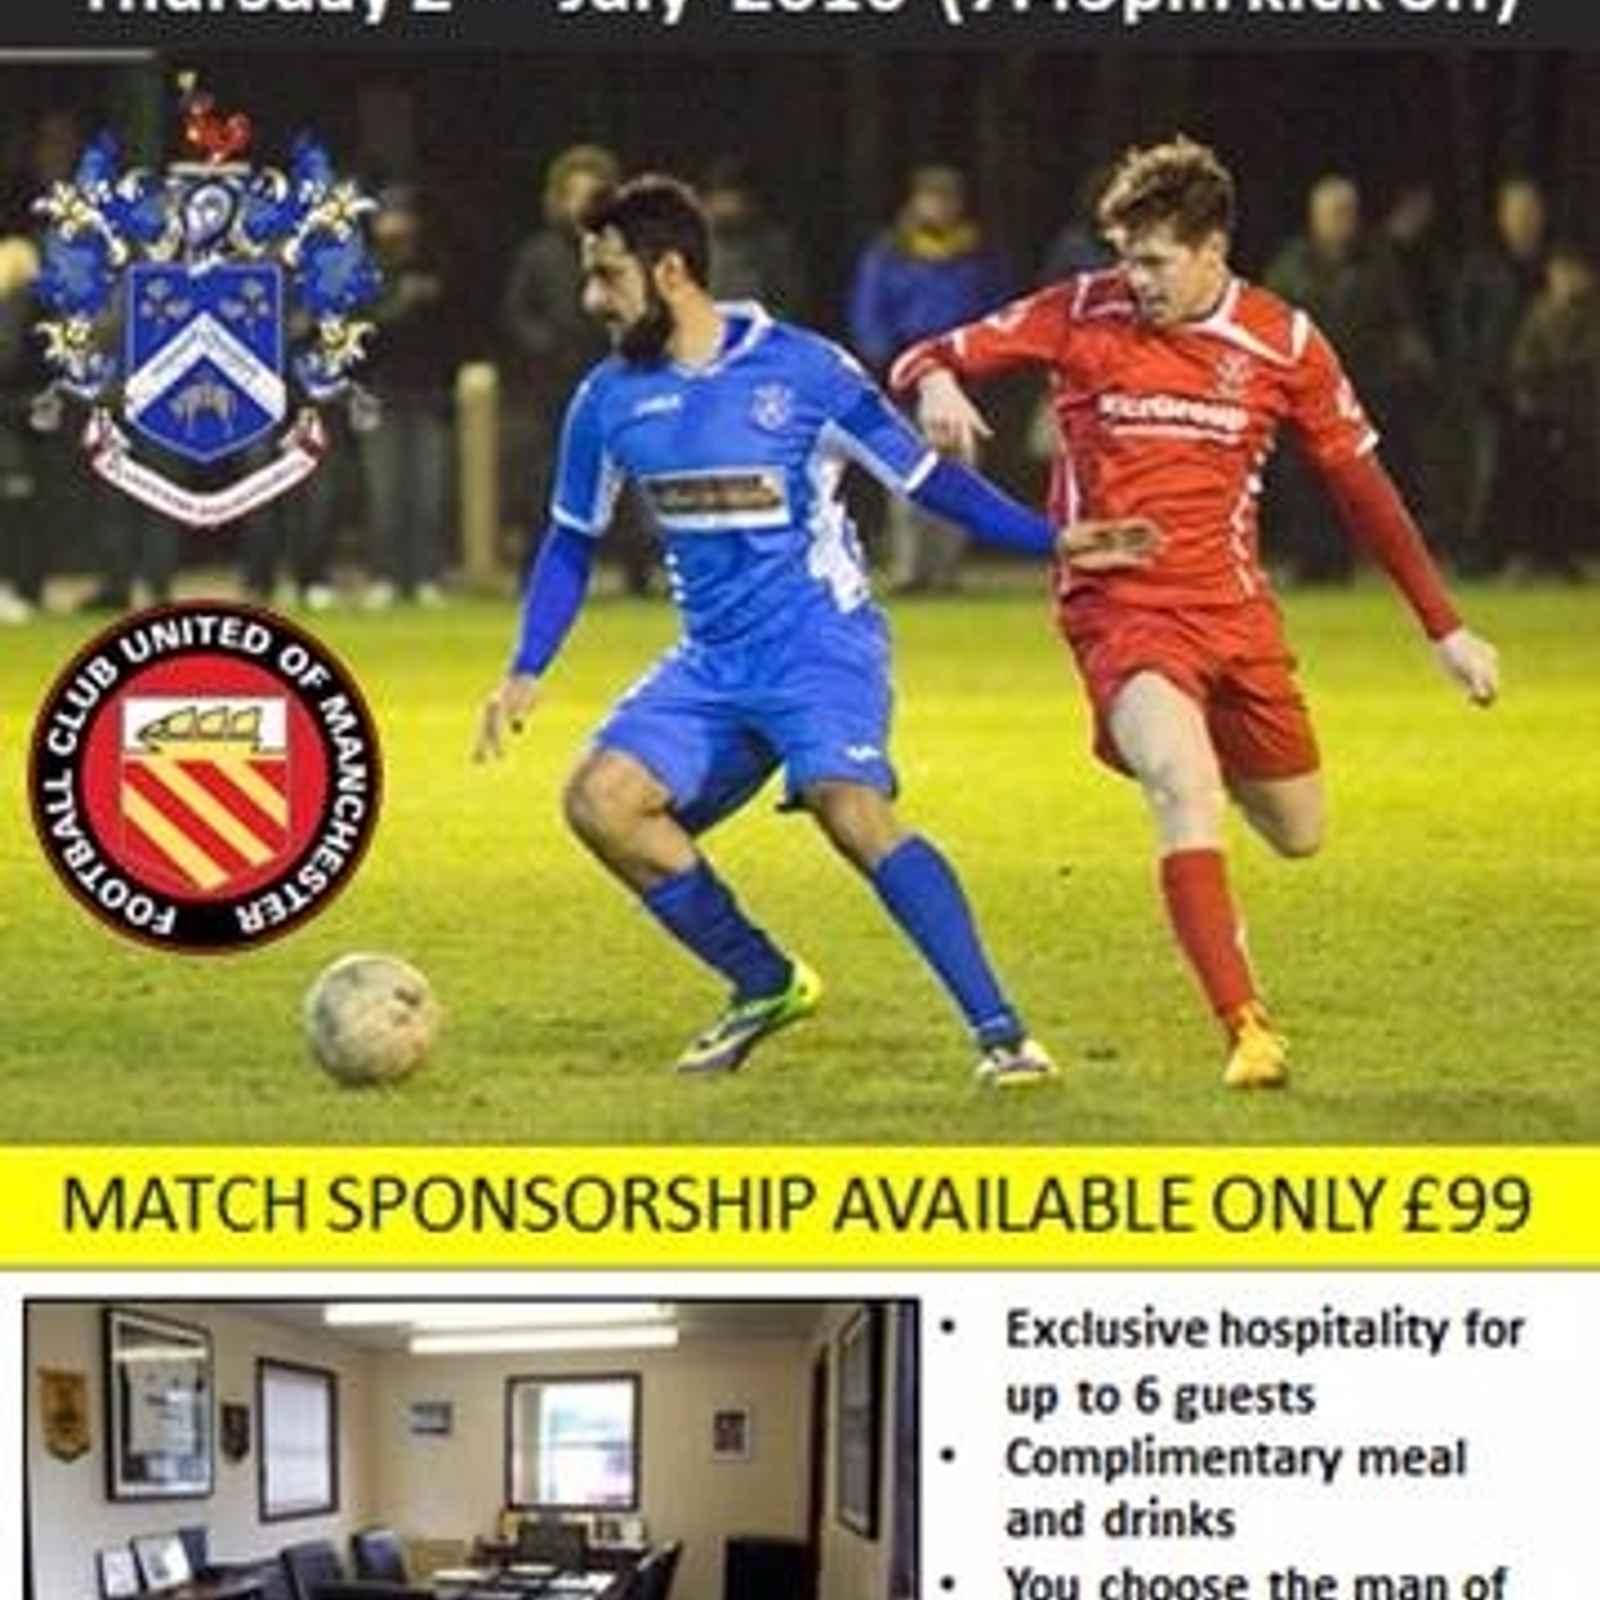 Nelson vs FCUM - Match Sponsorship Available!